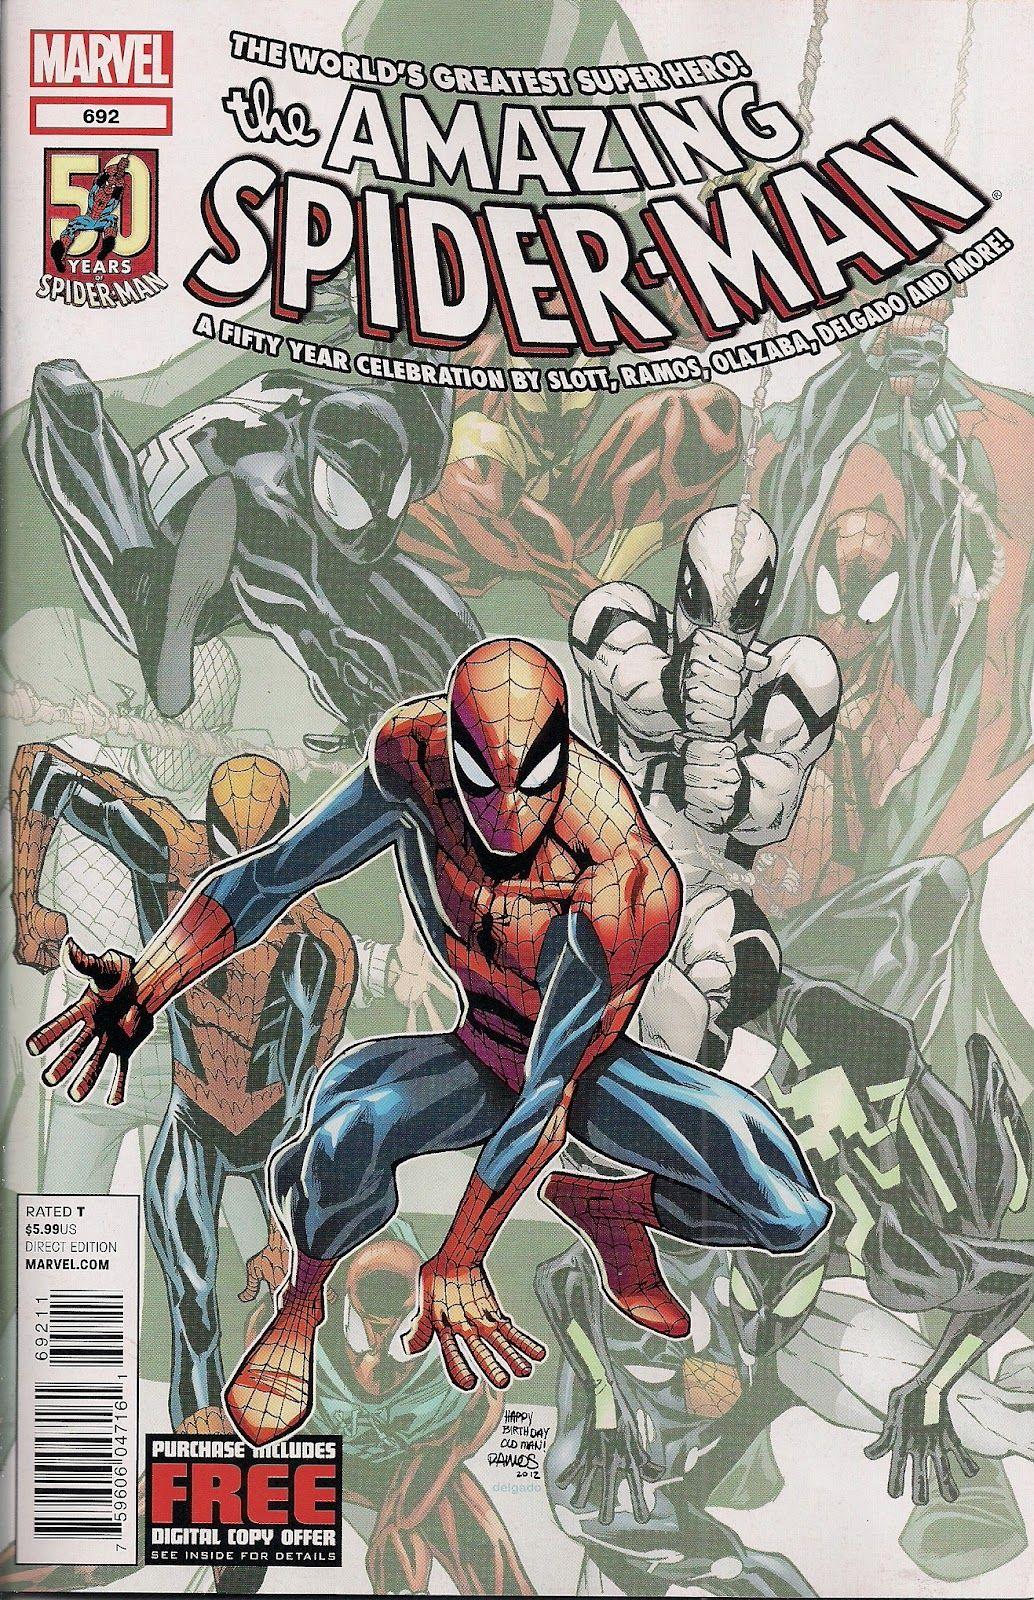 Cover To Amazing Spider Man 692 Amazing Spiderman Heros Marvel Marvel Comics